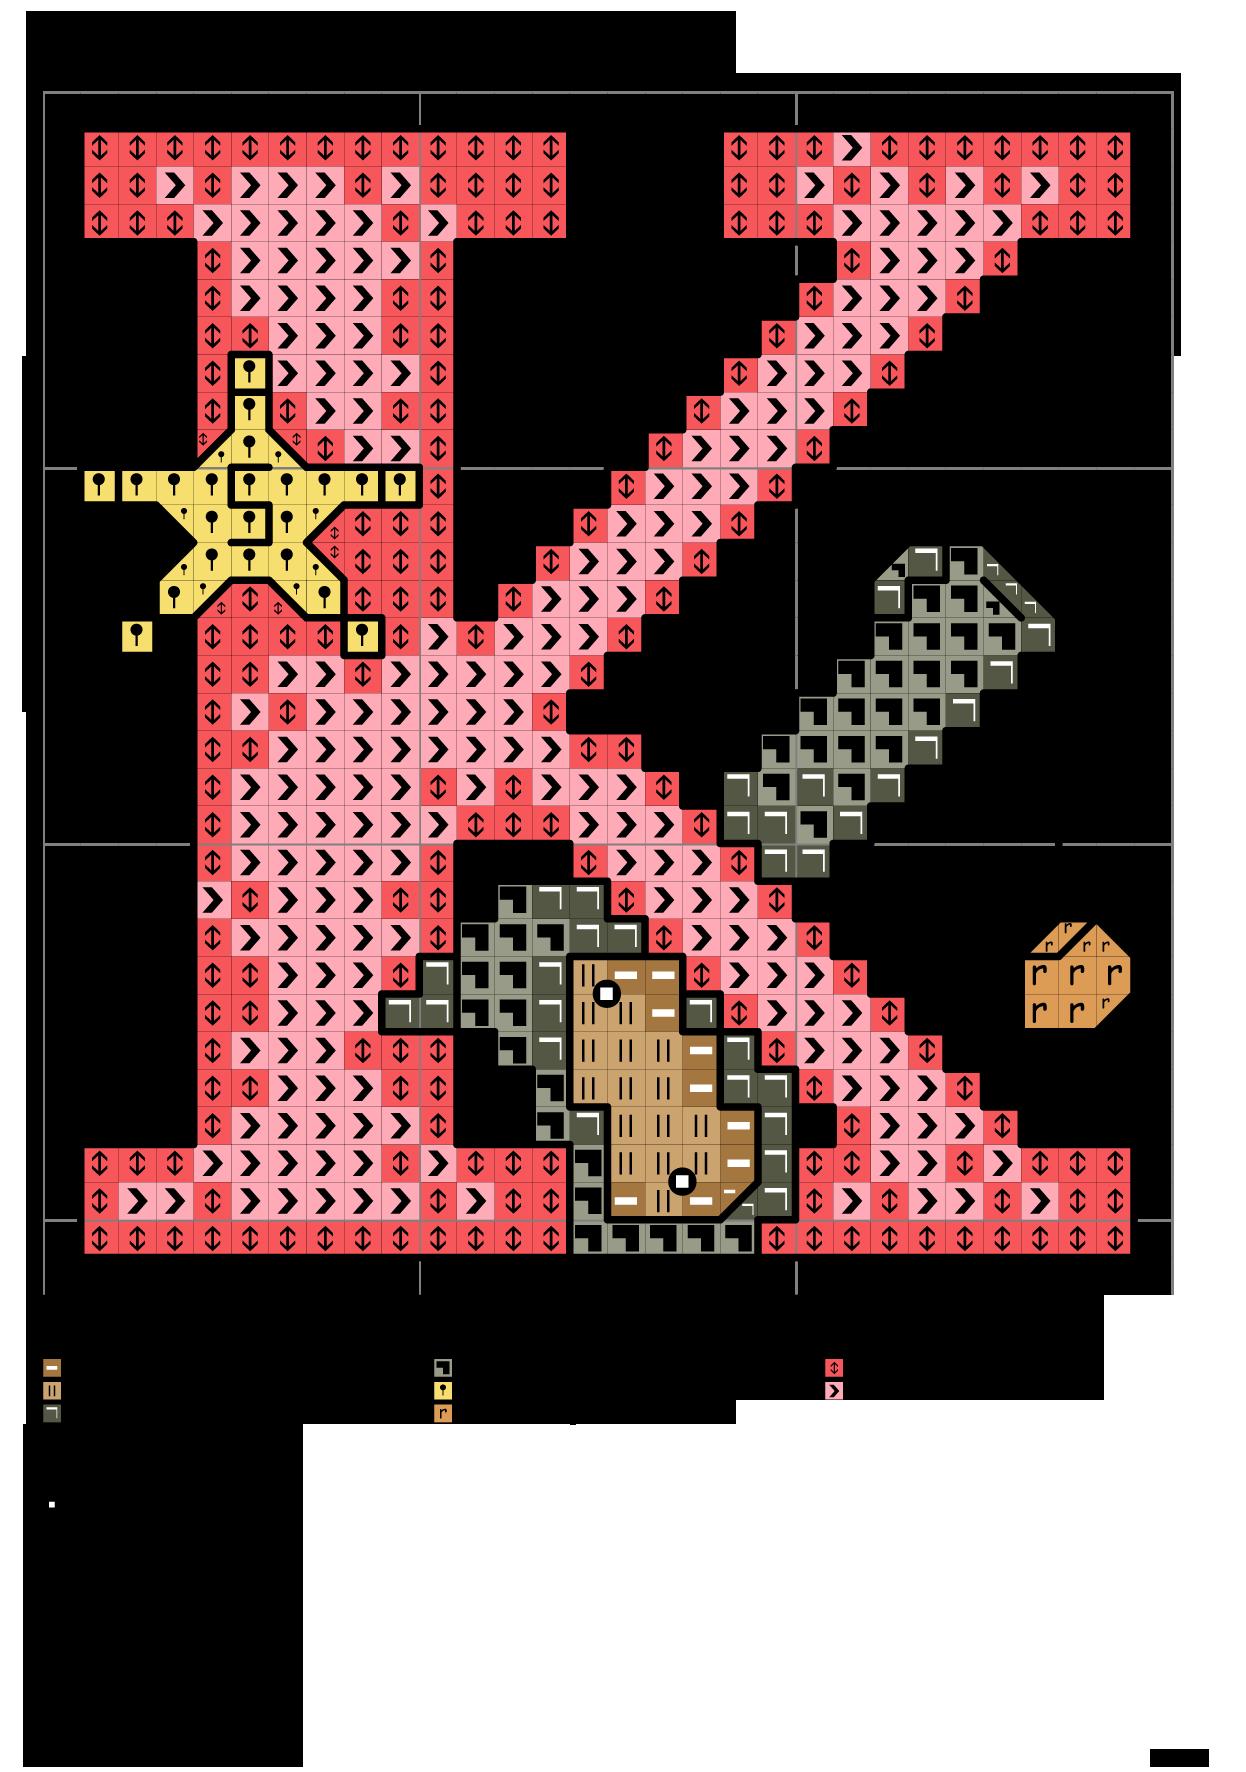 Alfabeto per bambini k punto croce punto croce bambino for Alfabeti a punto croce per bambini